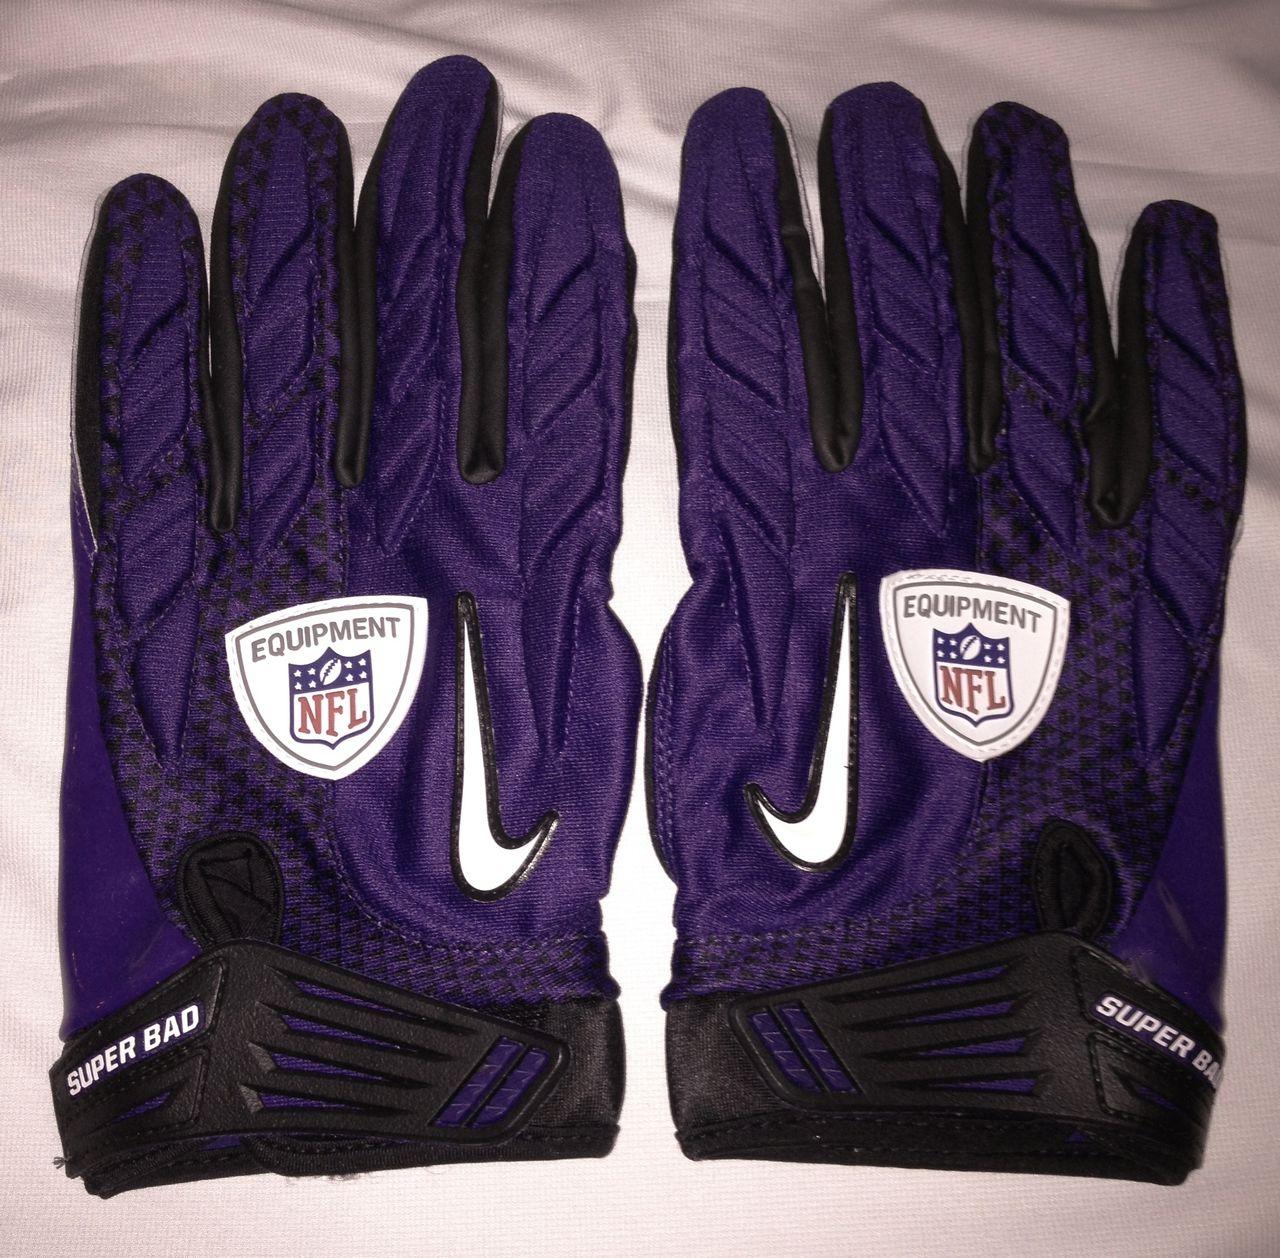 Nike Gloves Football: NEW Mens 3XL NIKE SUPERBAD SG NFL Equipment PURPLE